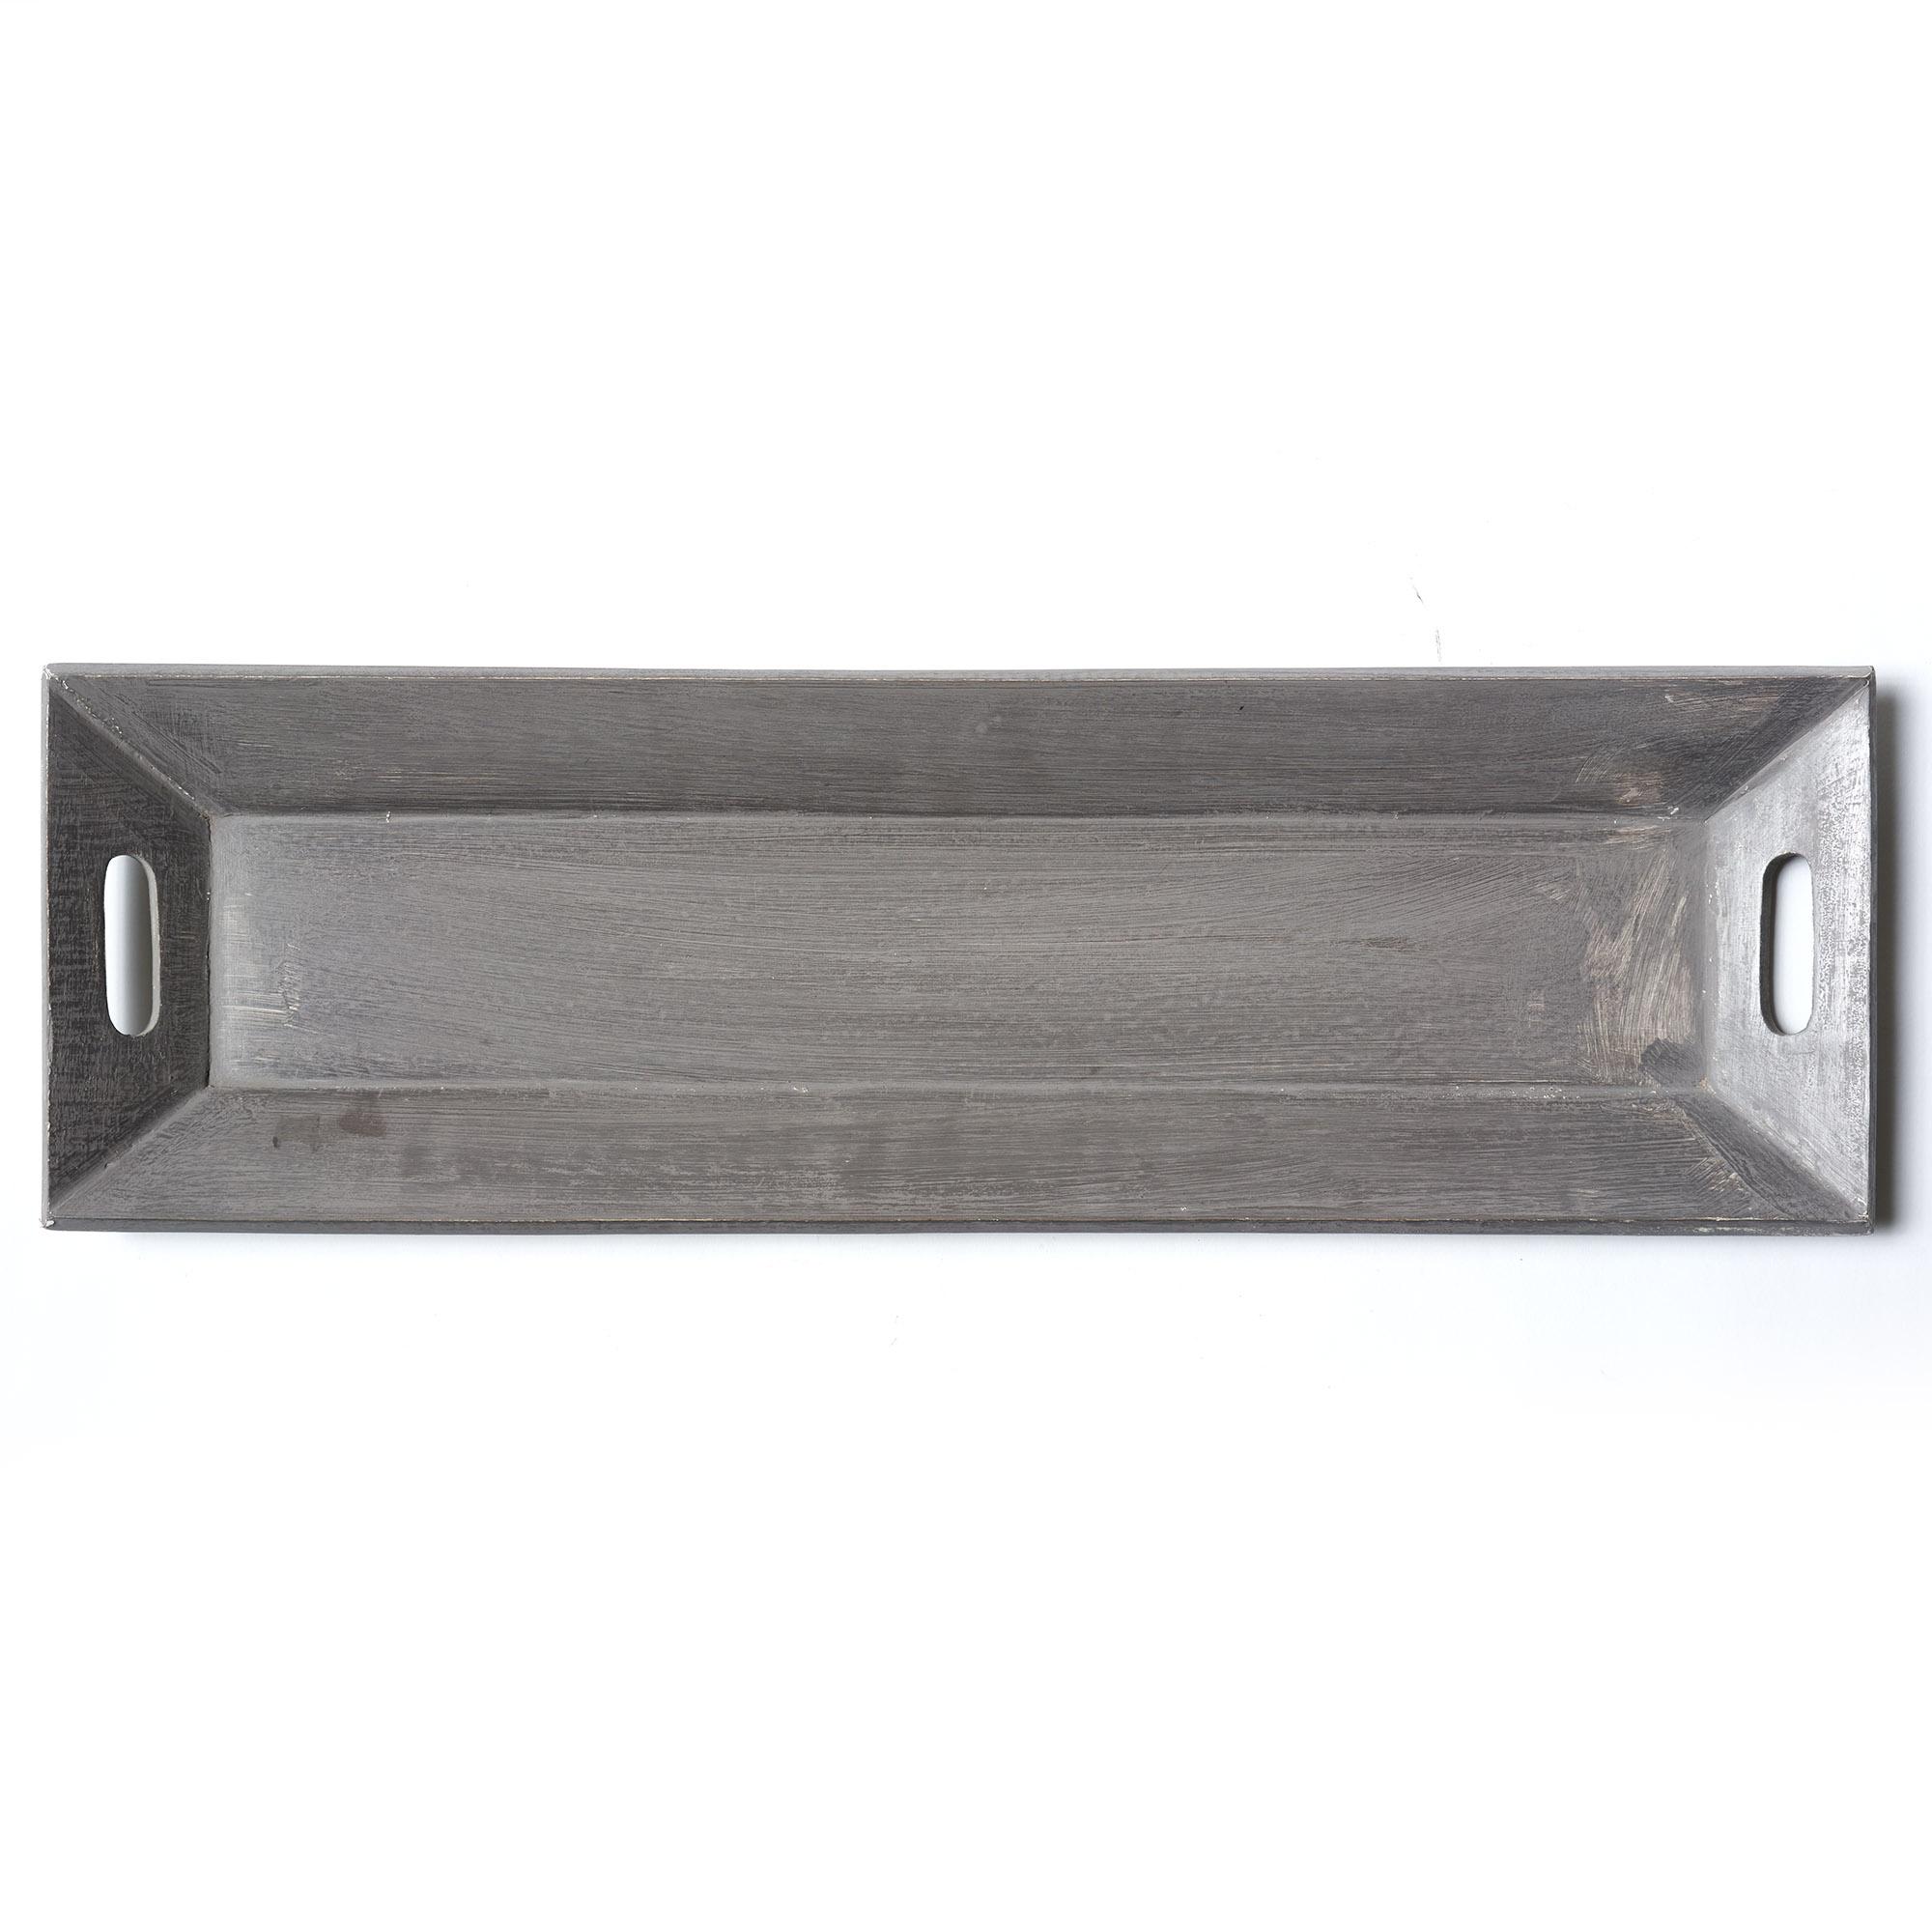 Bandeja de madera patinada gris 20 x 62.5 cm